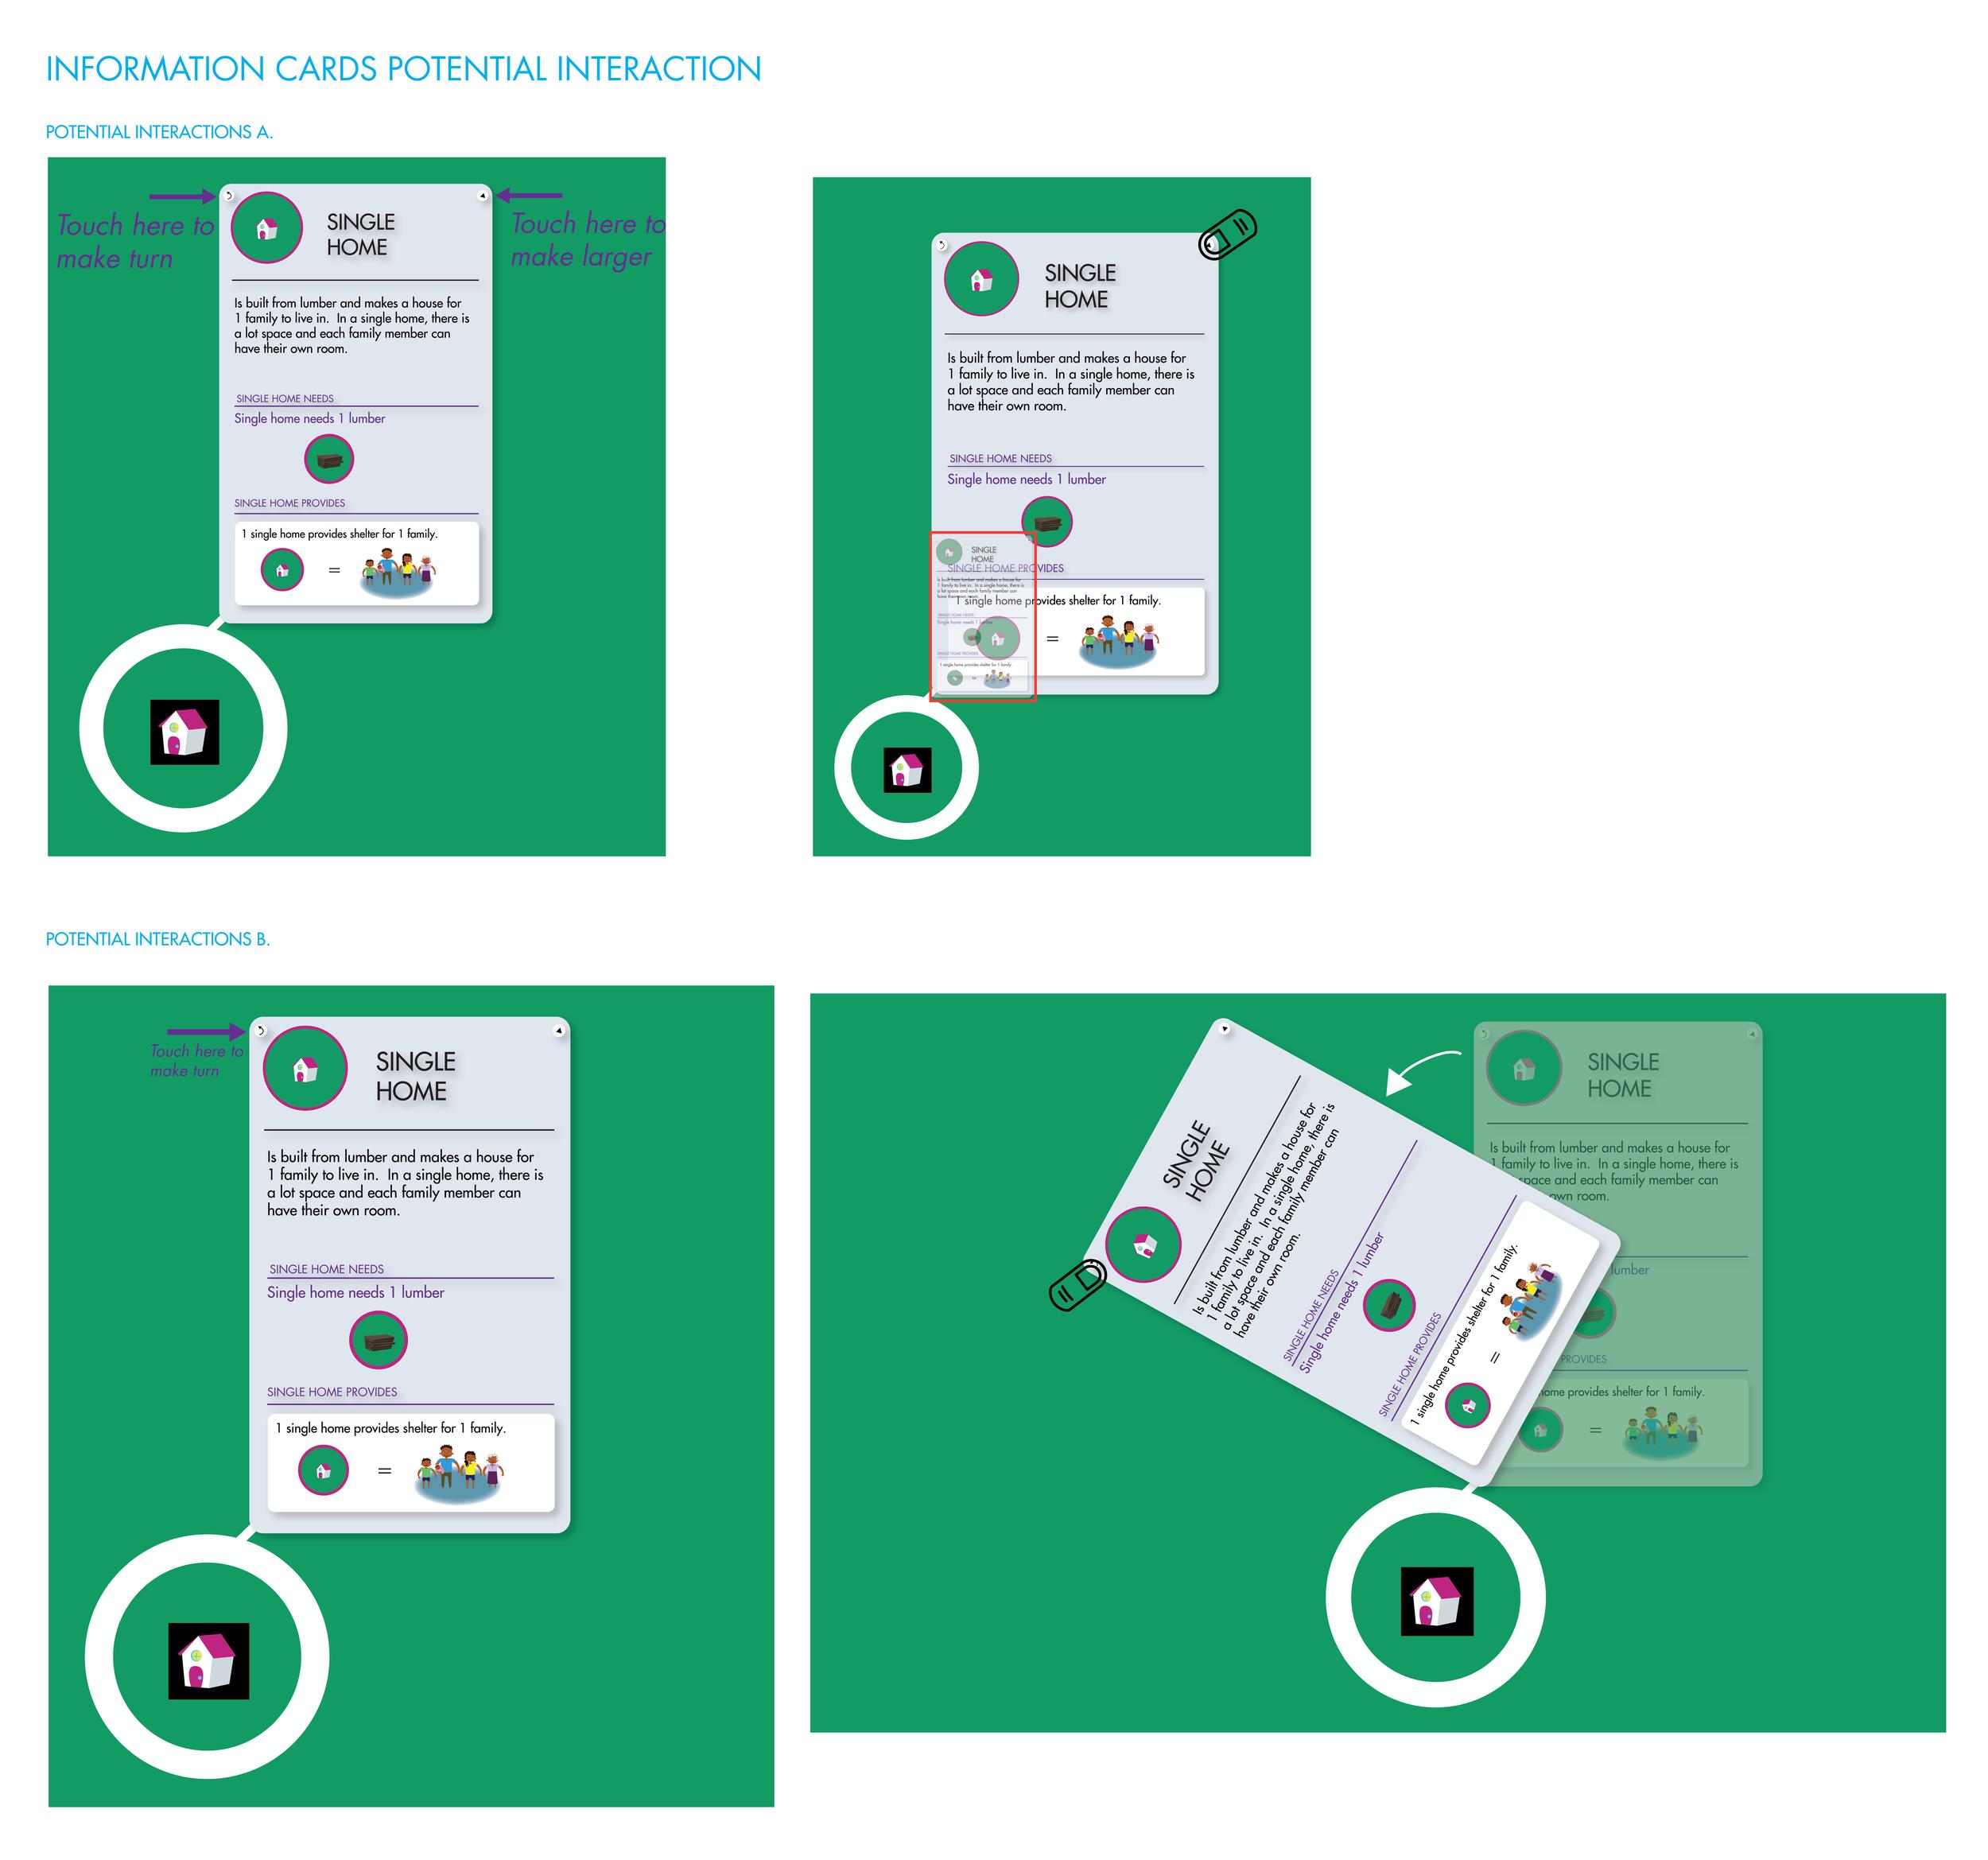 process_infocard_interaction-03.png